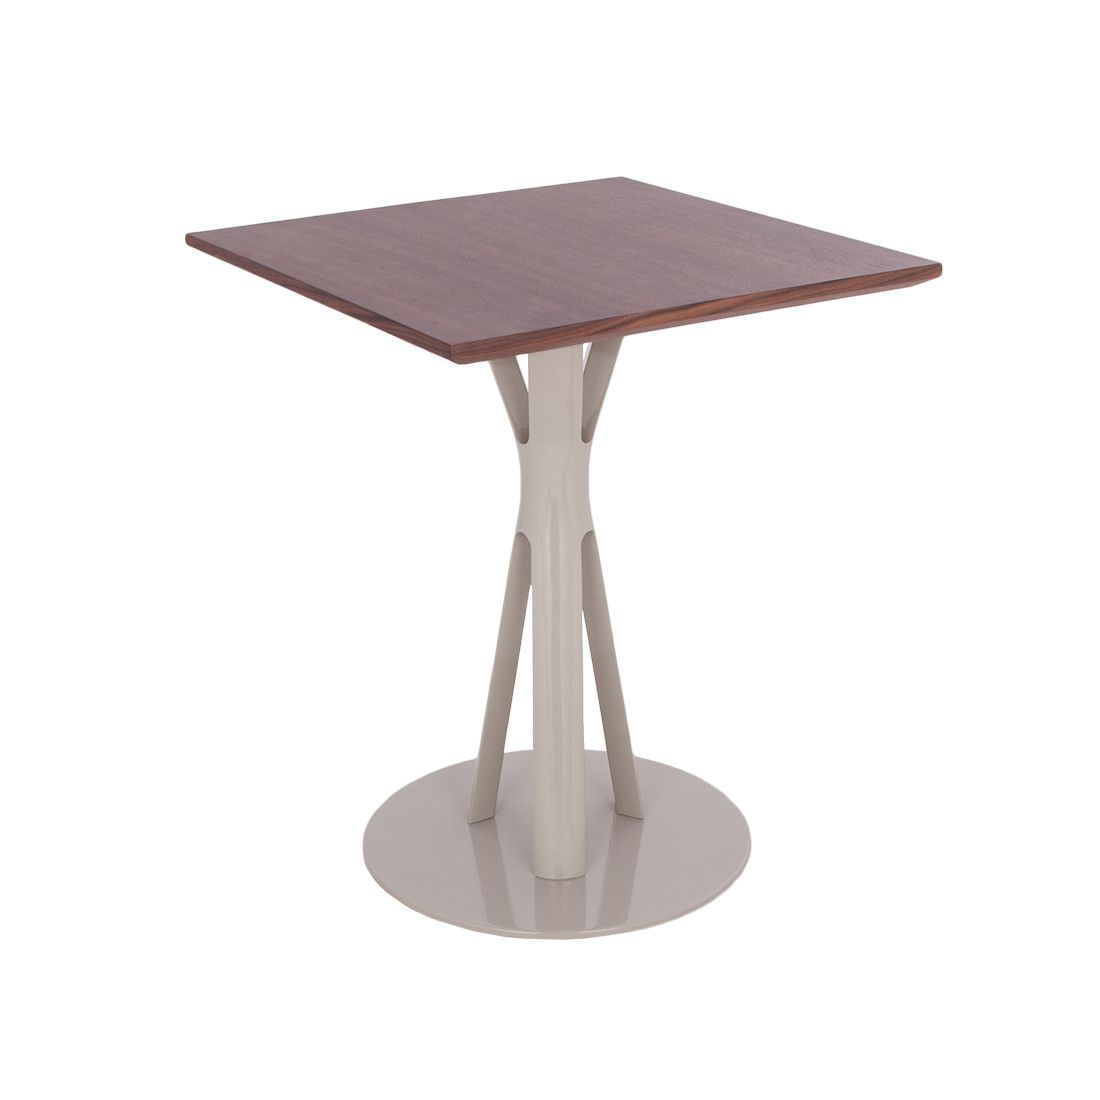 Sean Dix Split Dining Table 24 Square Dining Table Marble Pedestal Dining Table Pedestal Dining Table